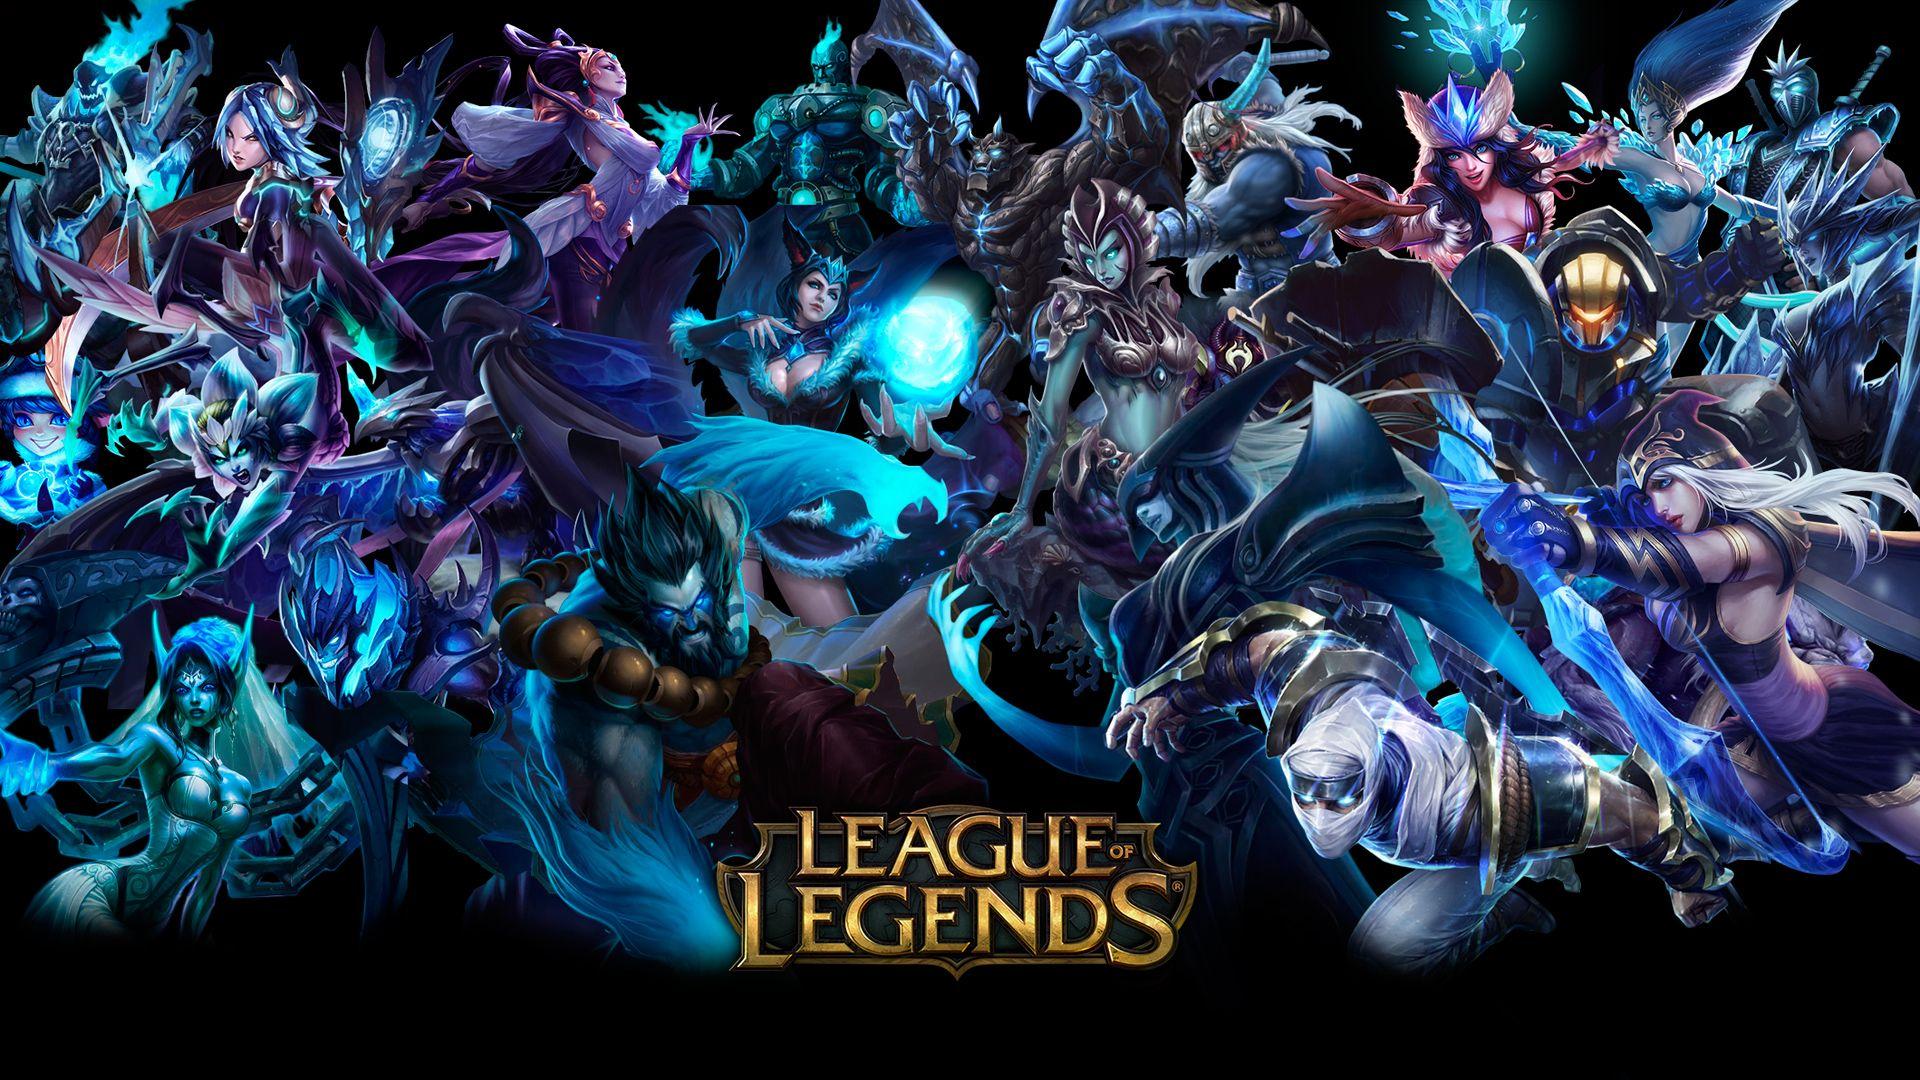 Make Your Own League of Legends Wallpaper Full HD 배경화면